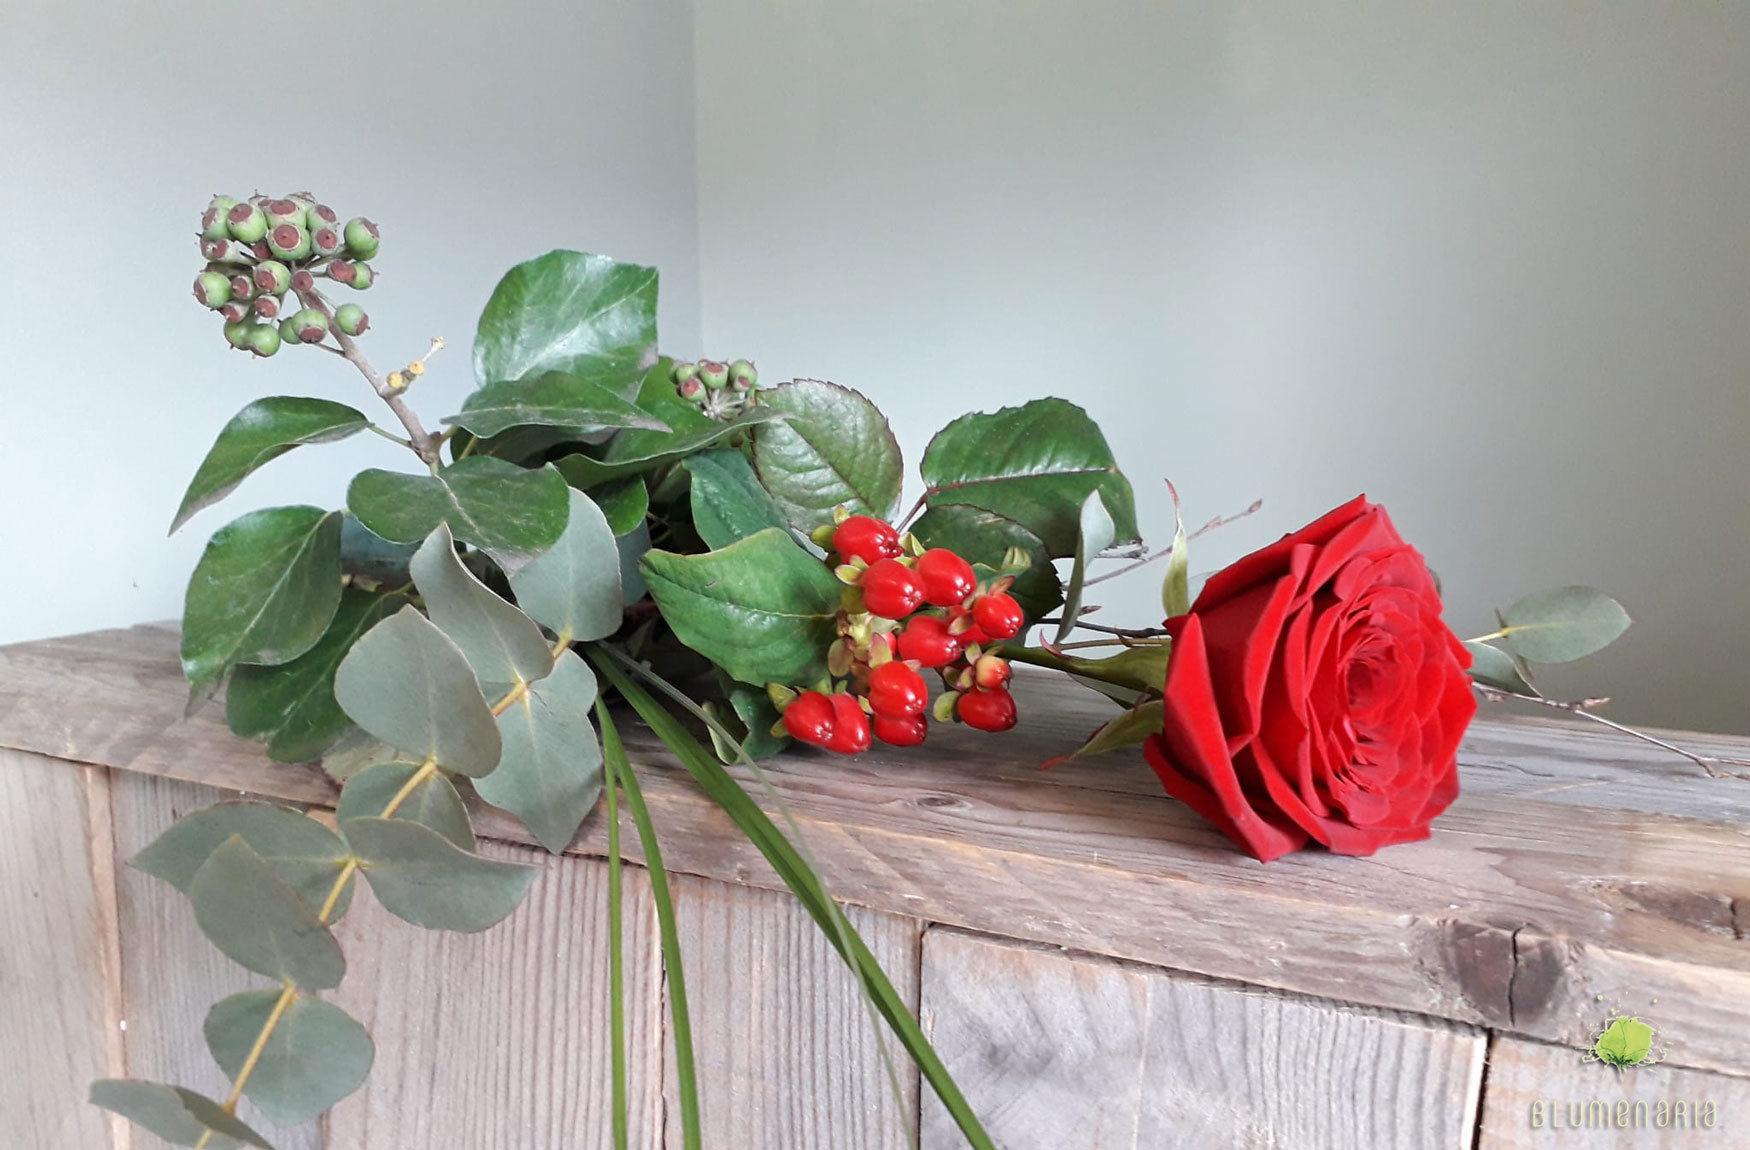 Flores San Valentín 2021 - Blumenaria Taller Floral